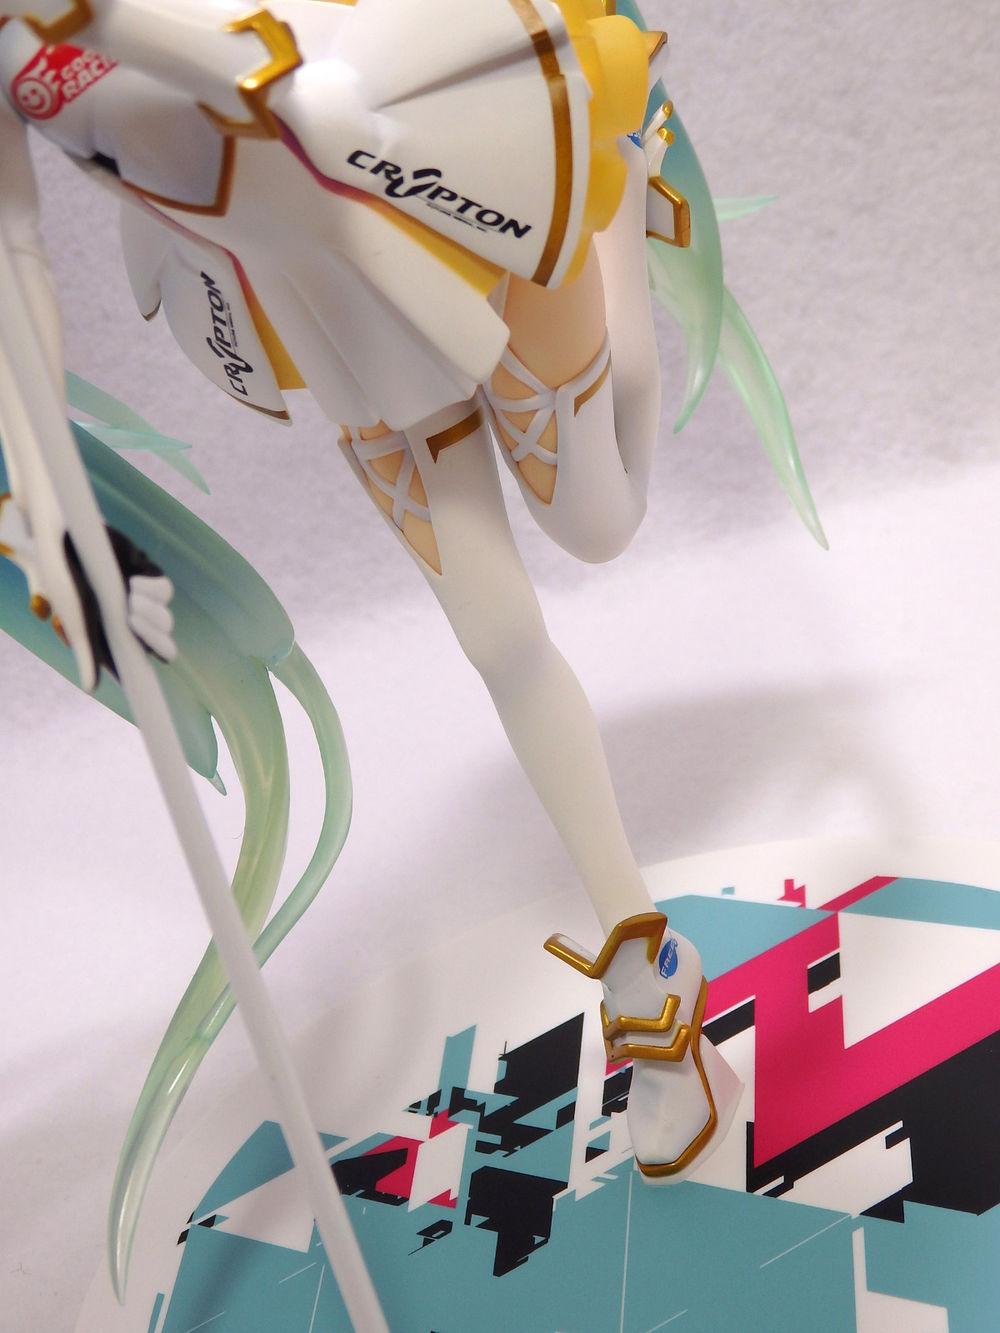 GSC Vocaloid 1/8 Hatsune Miku Garage Kit Model-Garage Kit Dolls